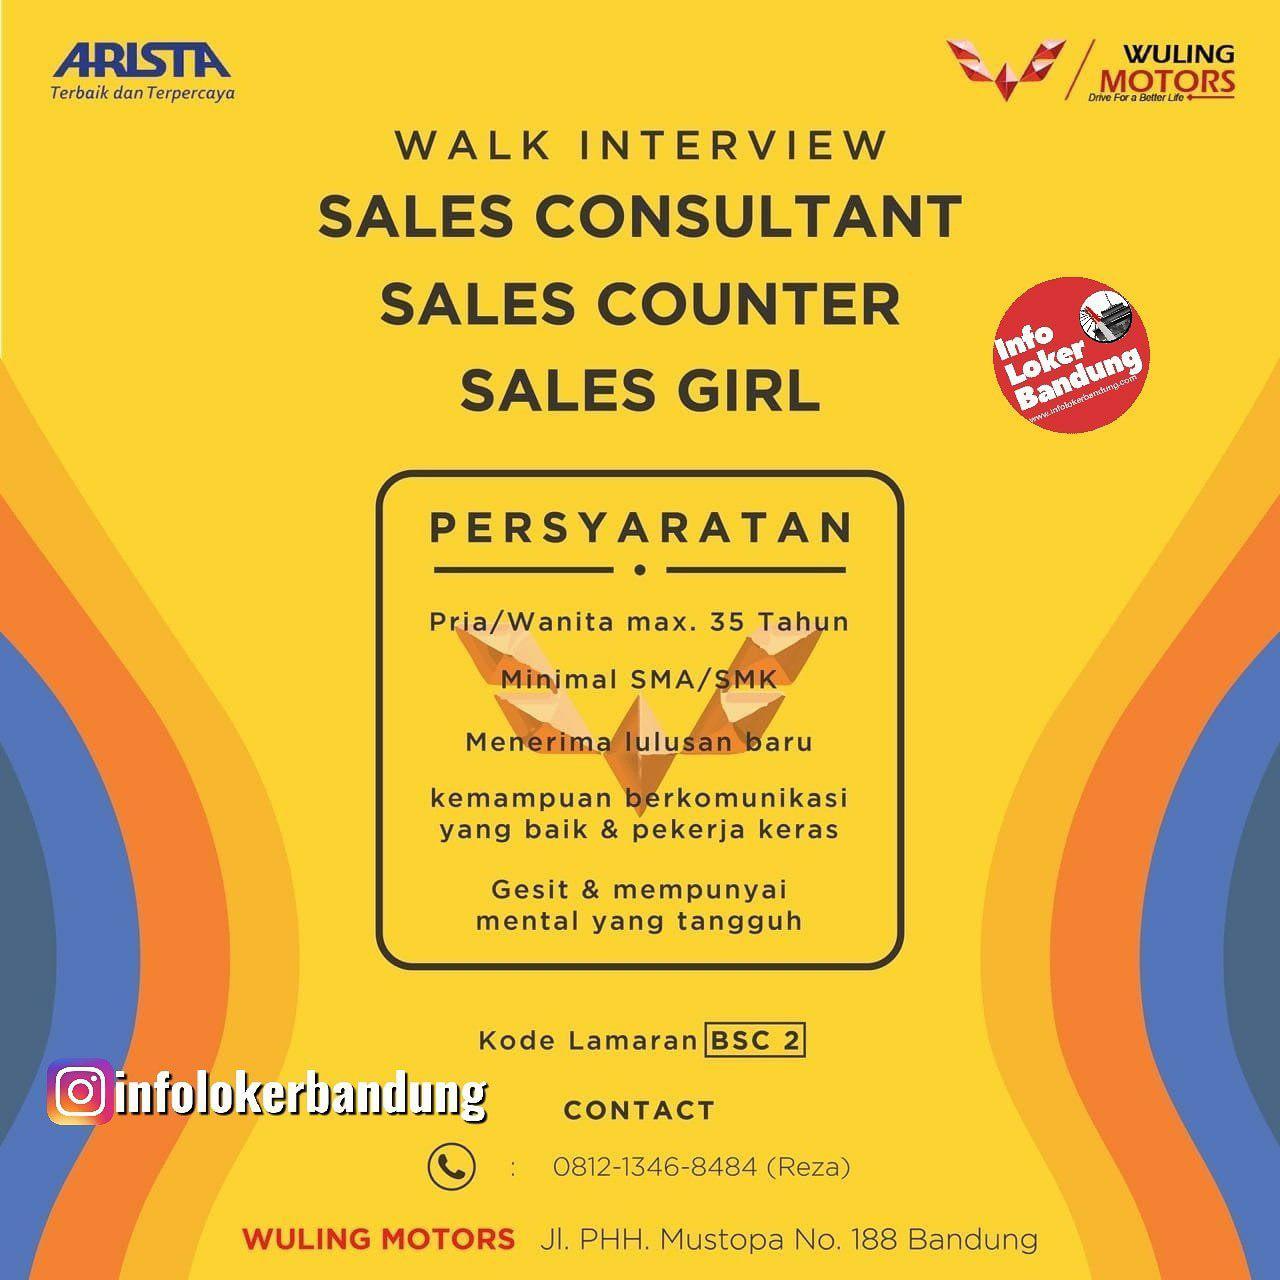 Lowongan Kerja Wuling Motors Bandung Walk In Interview September 2019 Info Loker Bandung 2021